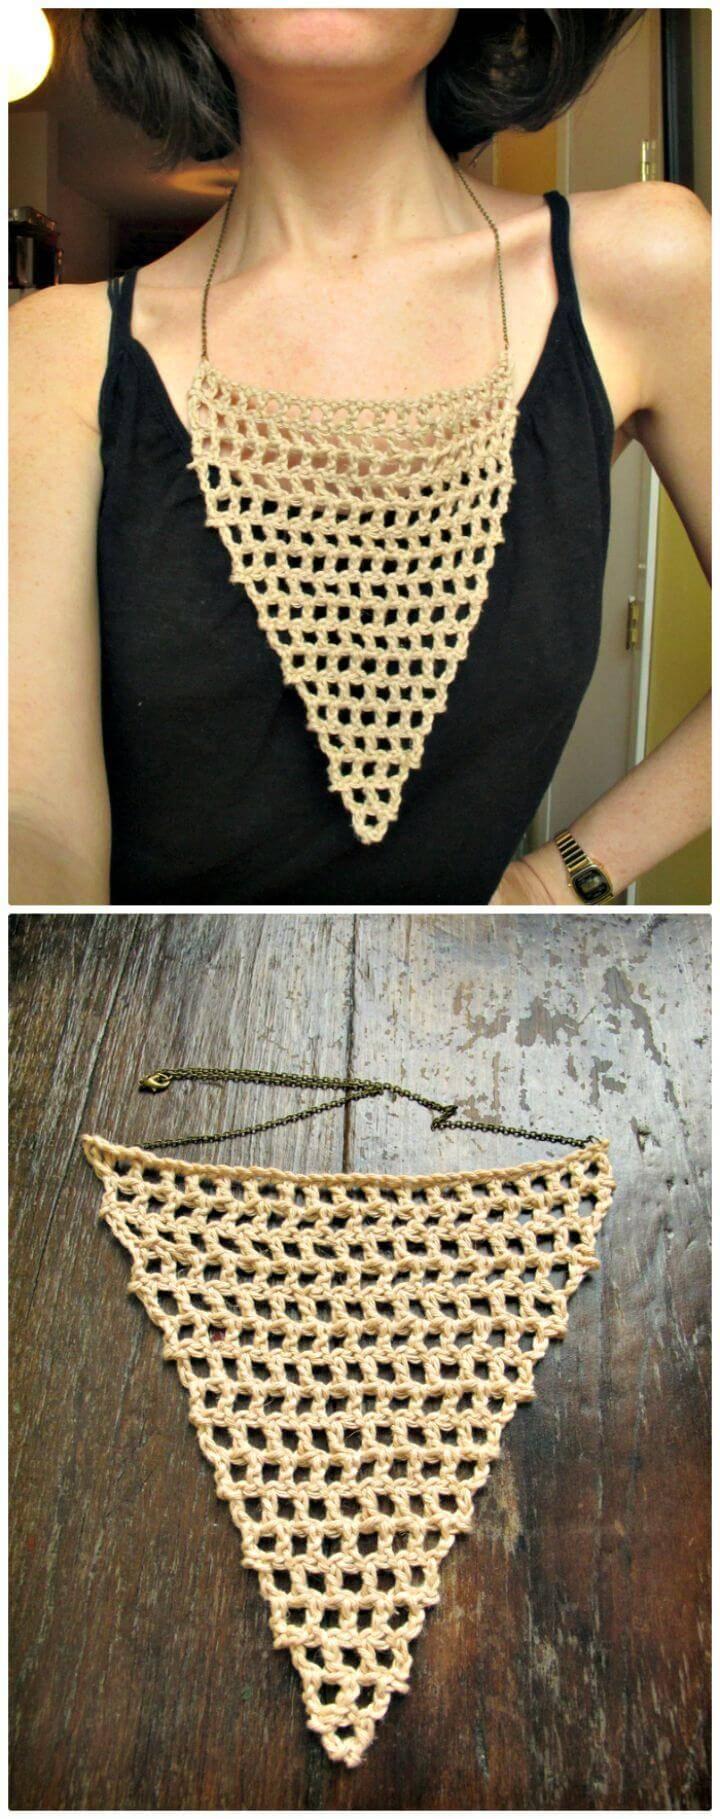 Crochet Necklace - 27 Free Crochet Patterns - DIY & Crafts